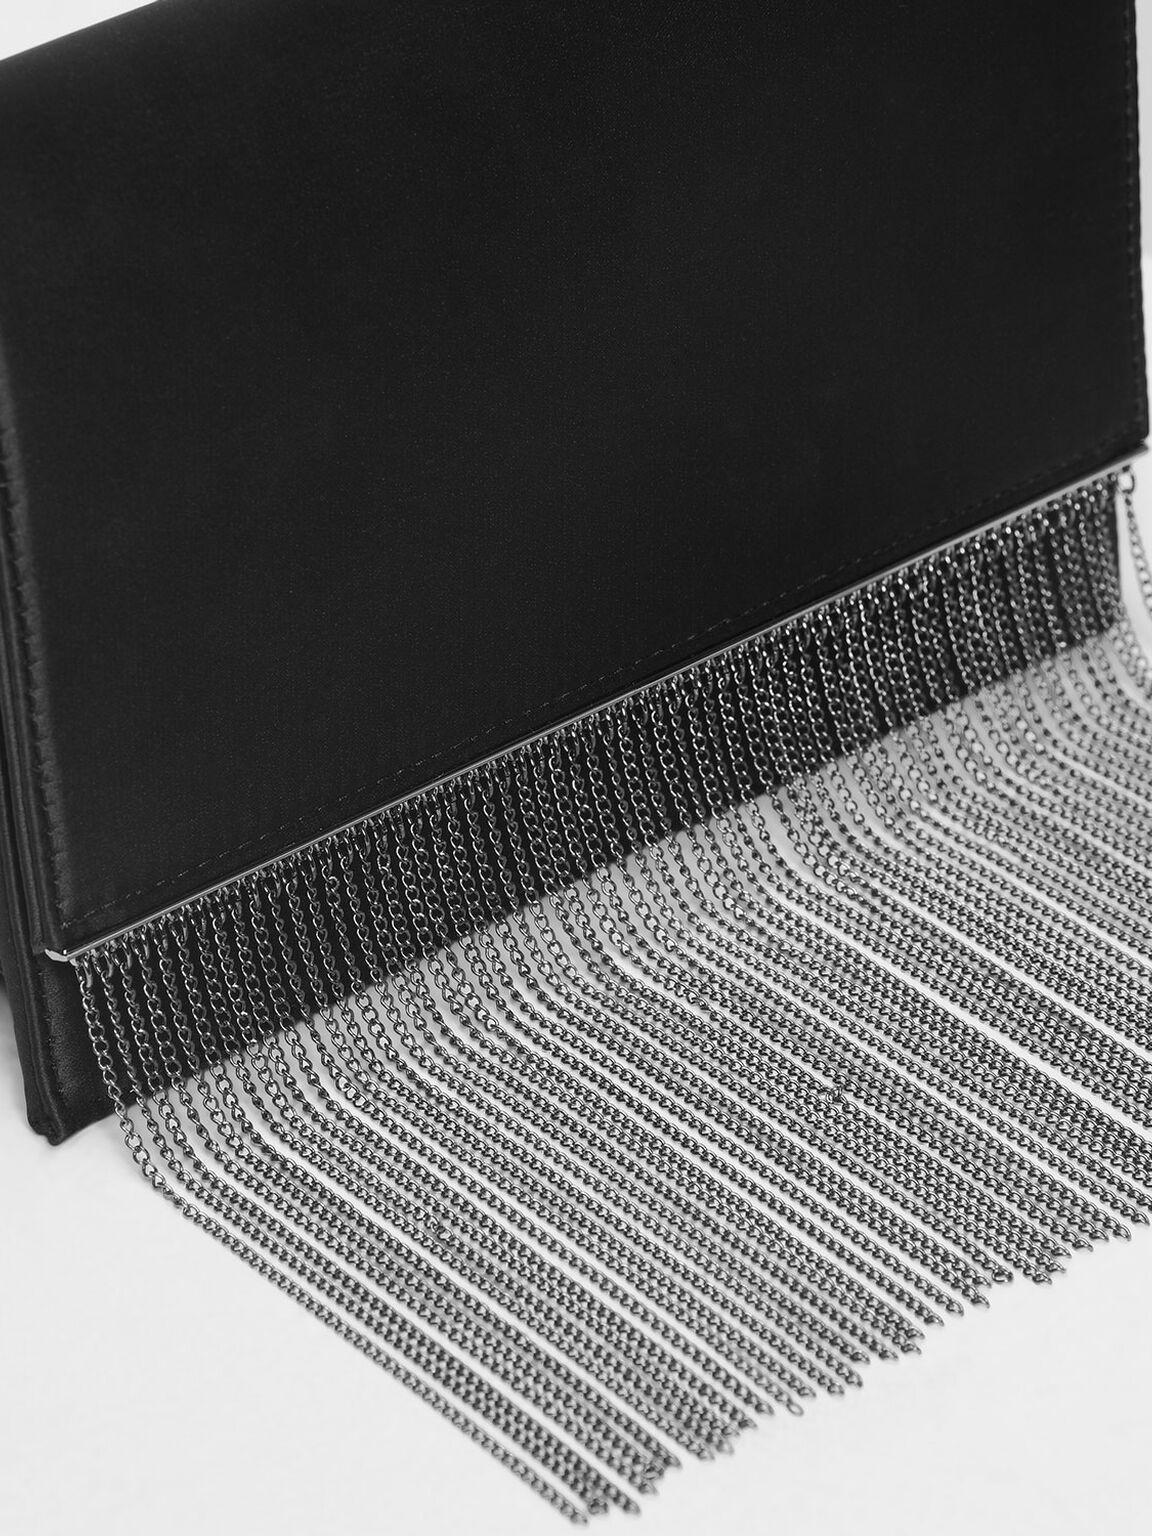 Chain Fringe Detail Clutch, Black, hi-res